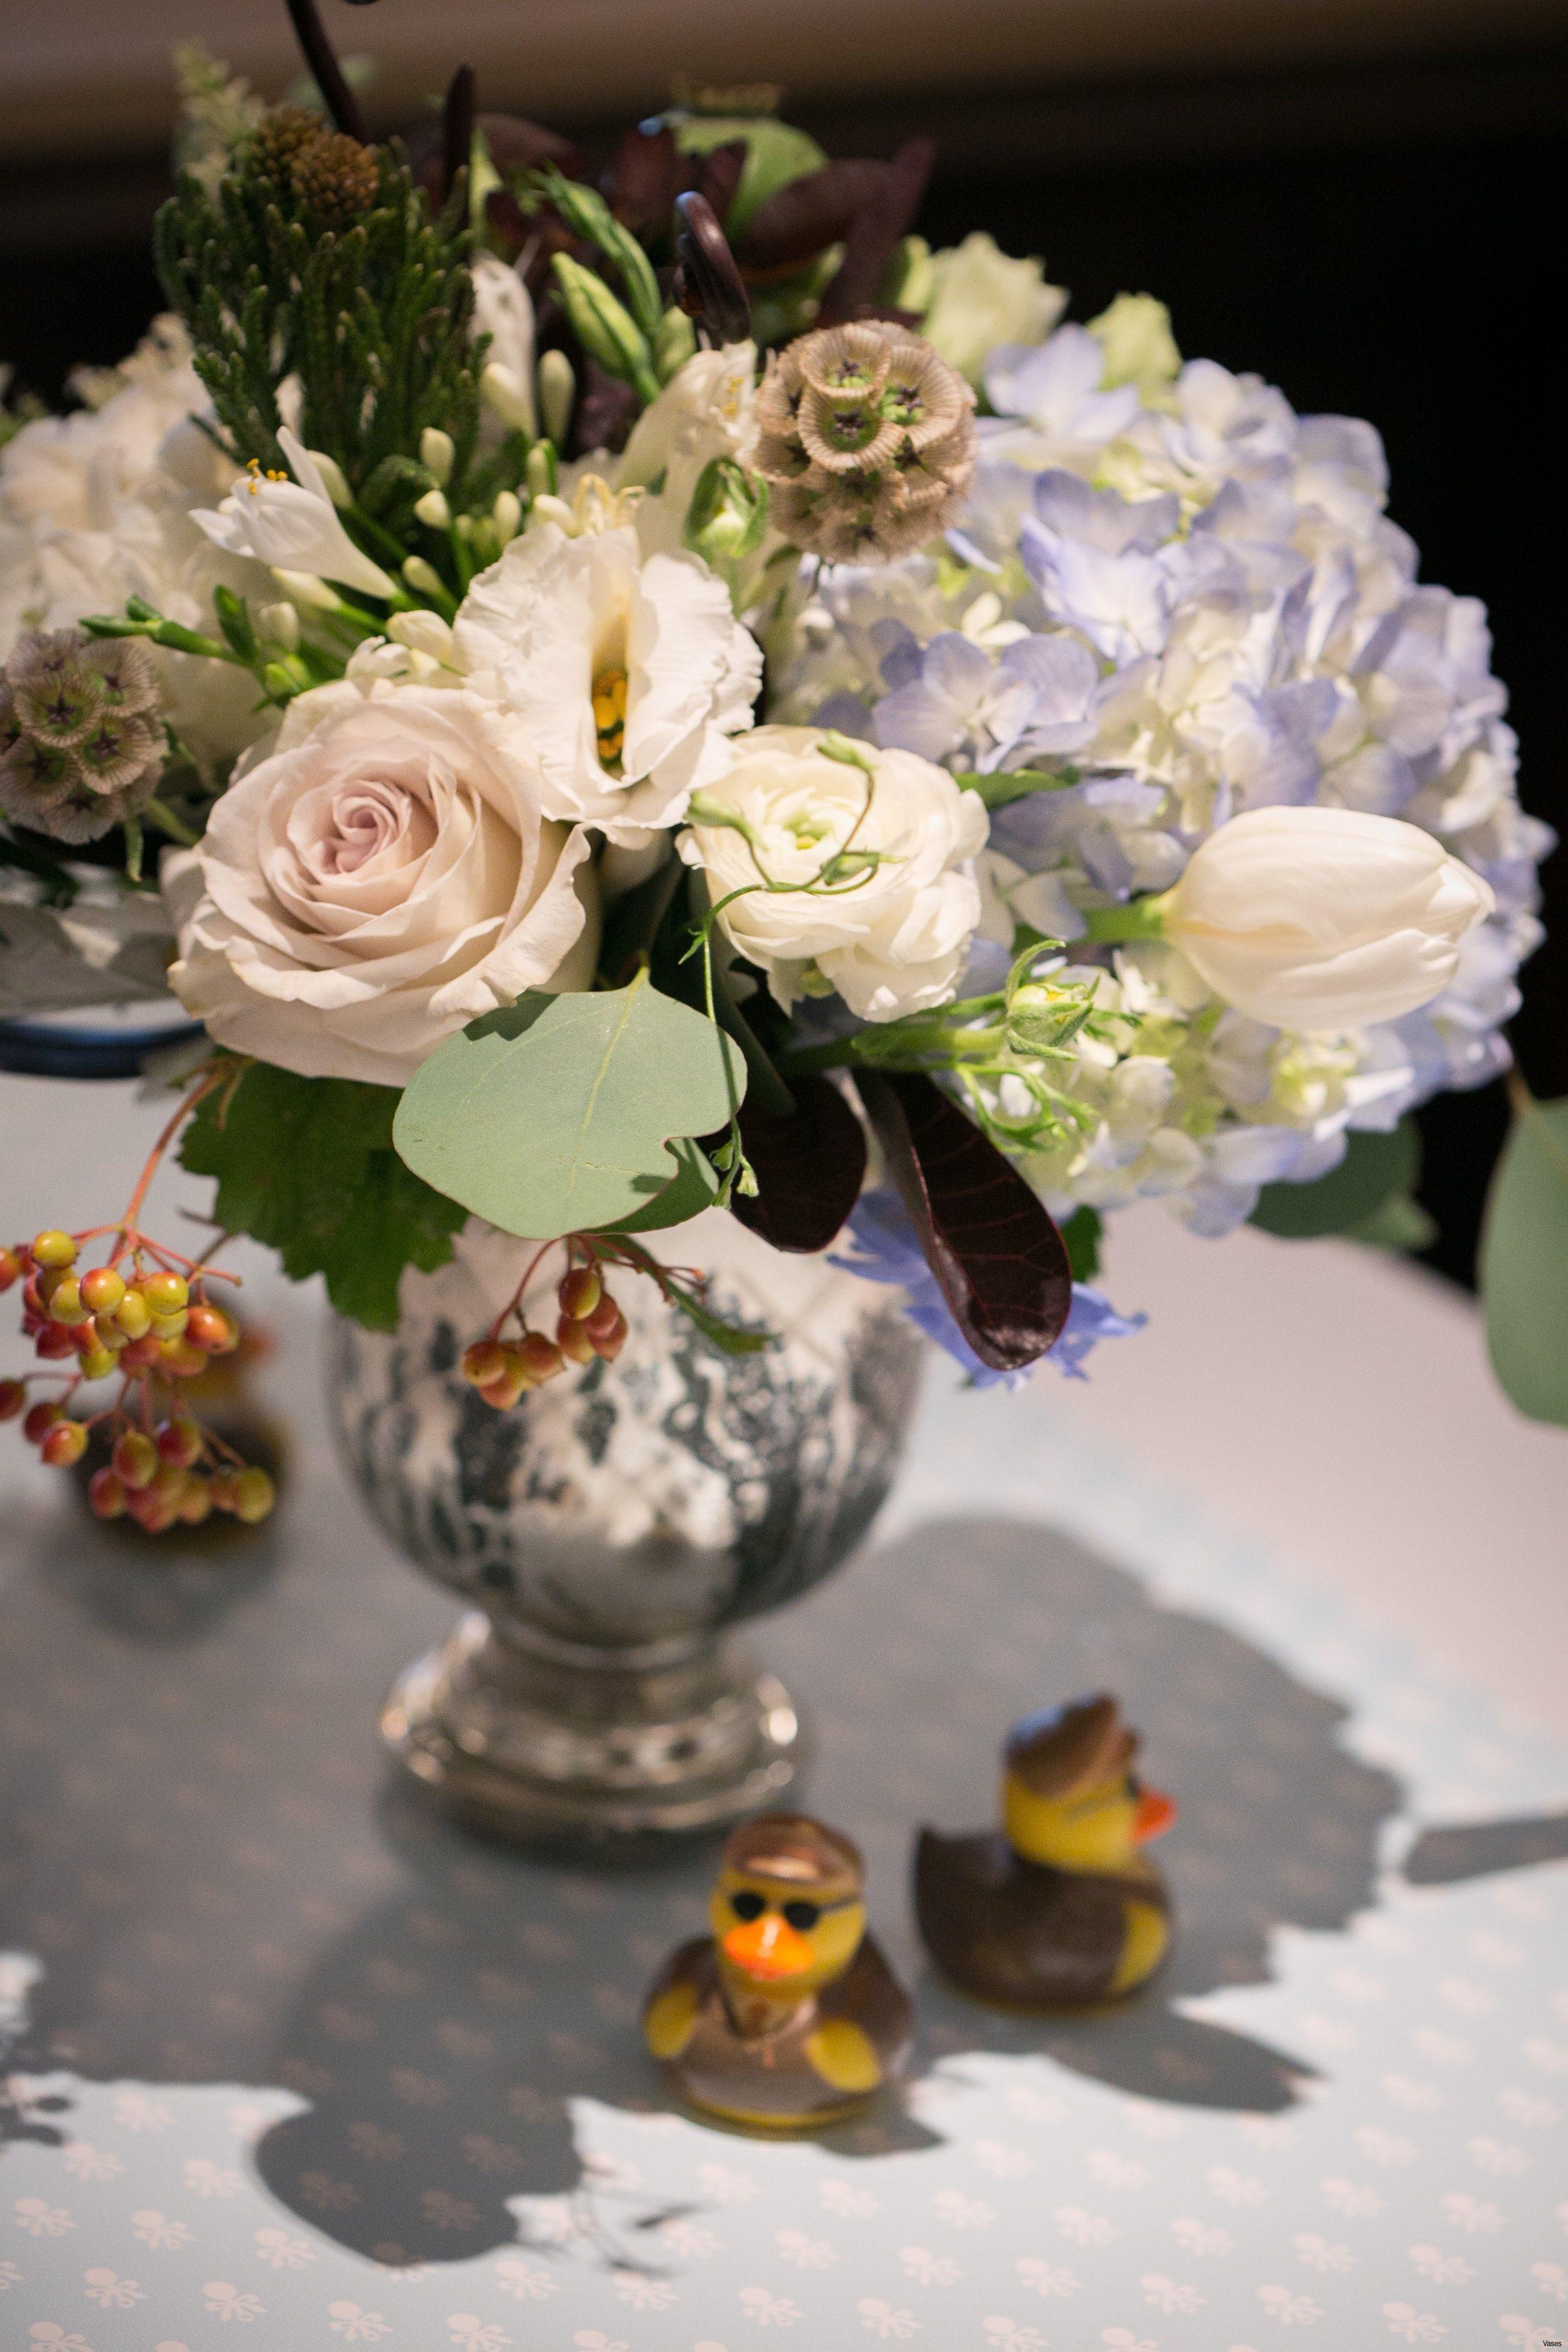 rose arrangements in vases of 25 blue flower vase the weekly world in flower vases for baby shower baby shower floral vases u2022 baby